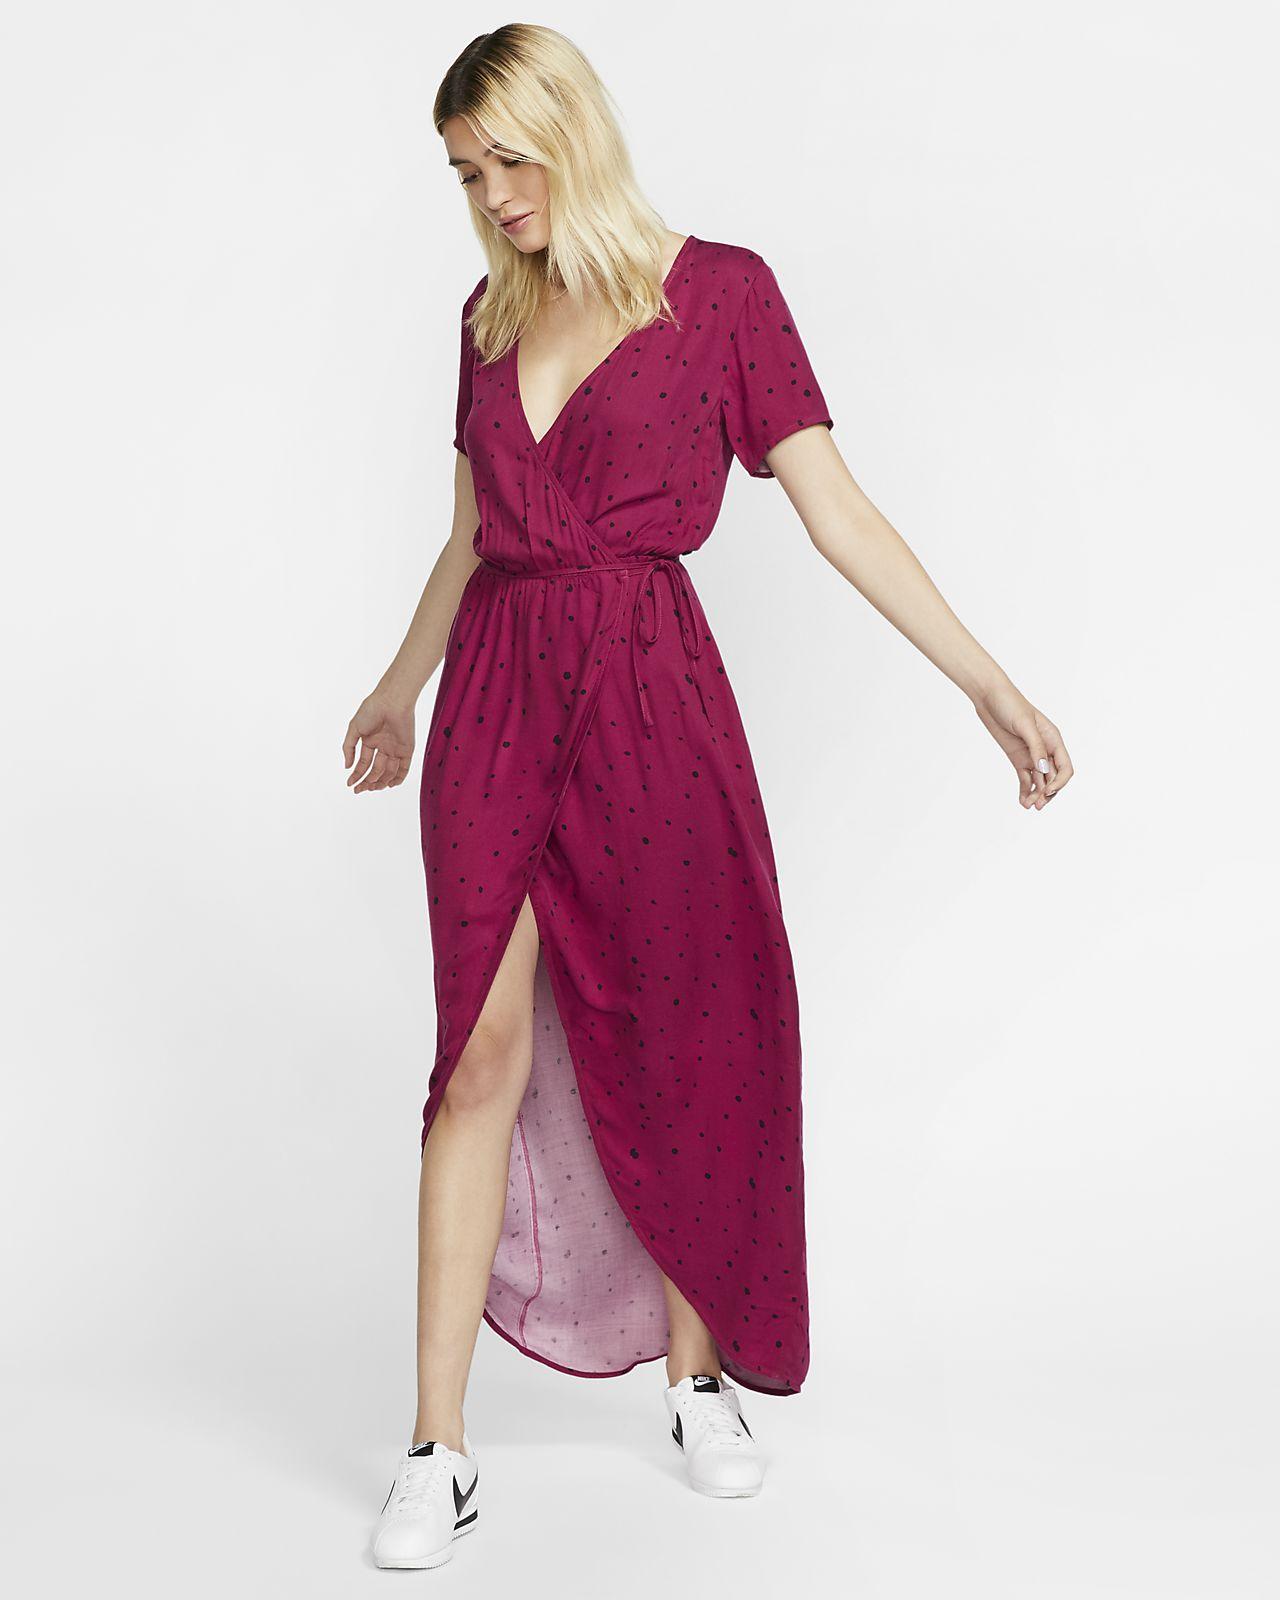 Hurley Dot Party Wrap Women's Dress